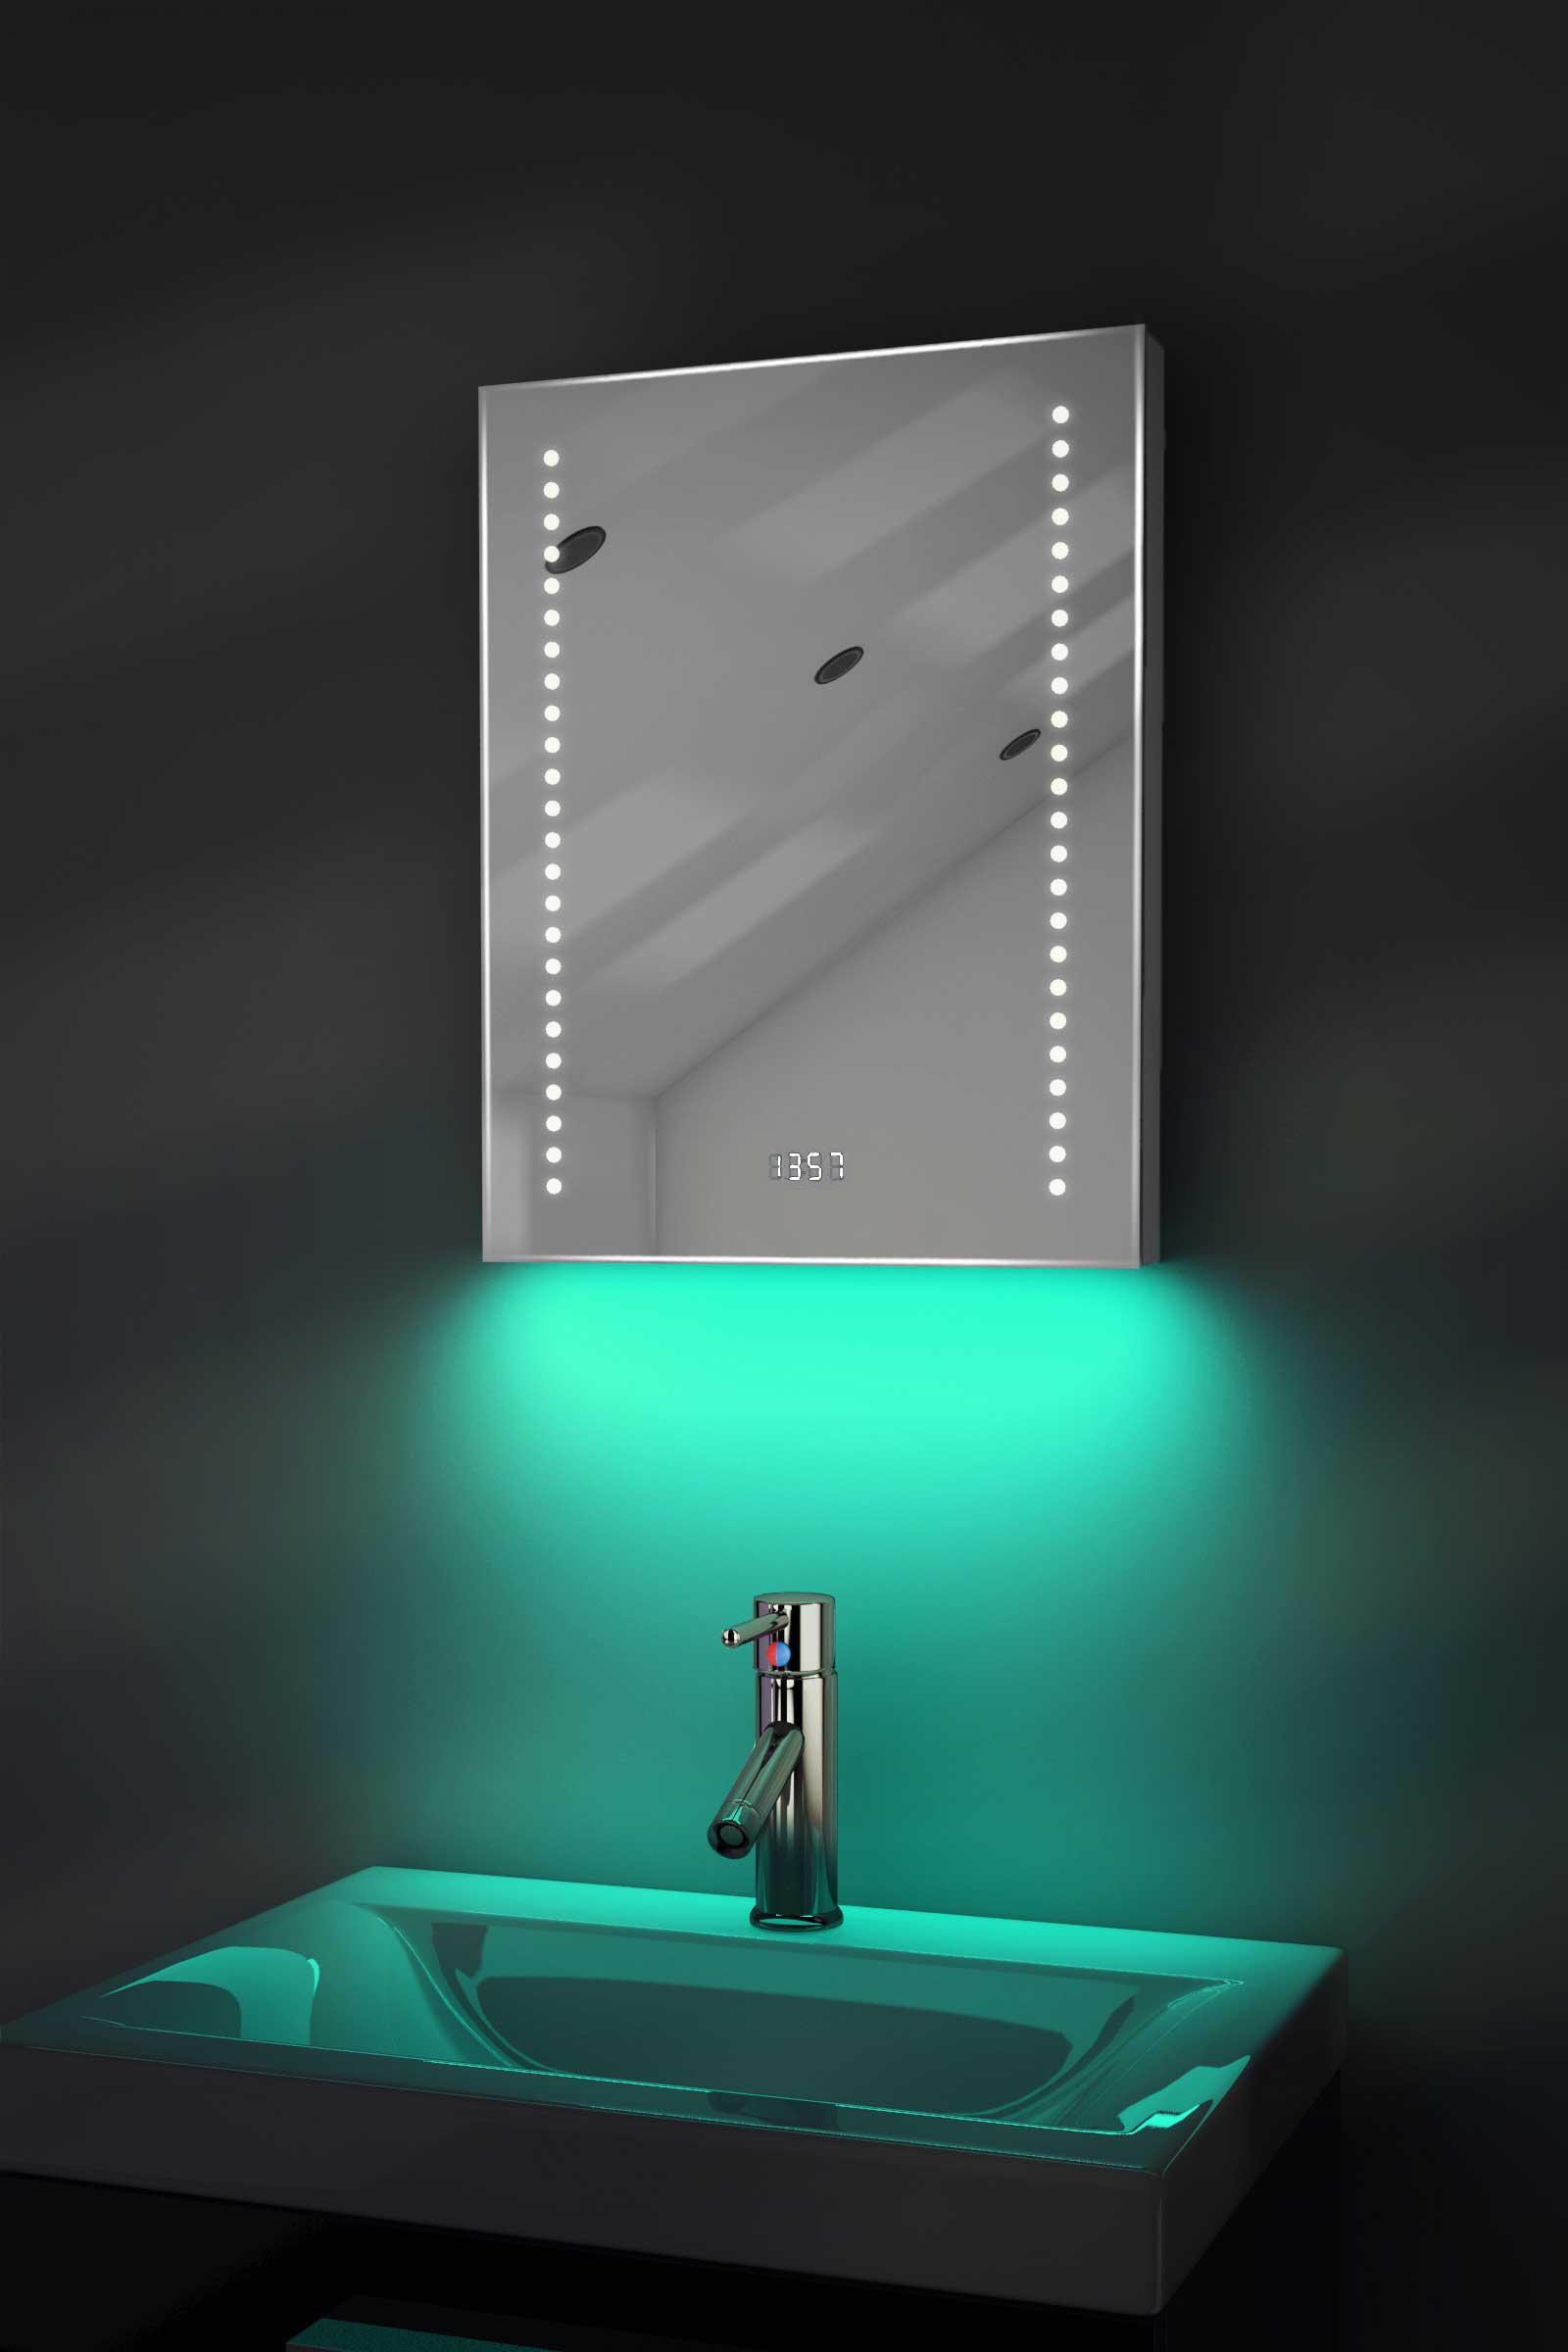 Digital Clock Shaver Bathroom Mirror With Under Lighting Demist Sensor K189 Ebay